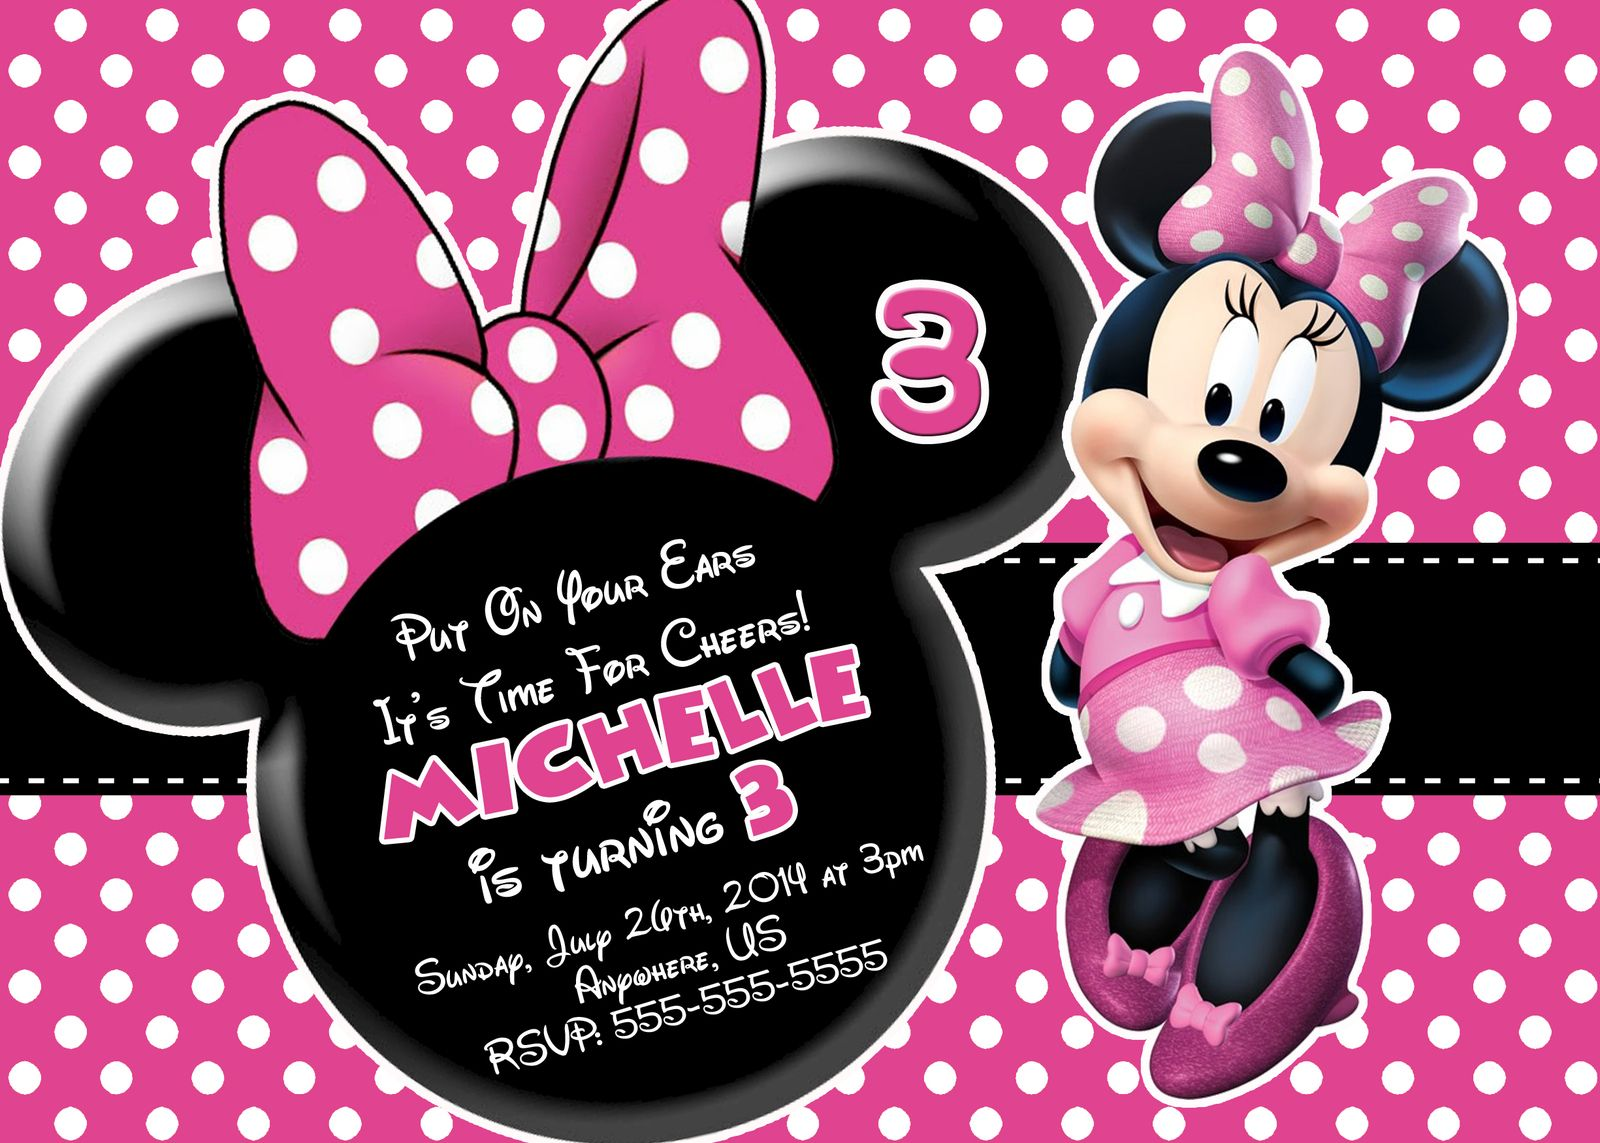 Minnie Mouse Printable Birthday Invitations Minnie Mouse Invitations Minnie Invitations Minnie Mouse Birthday Invitations